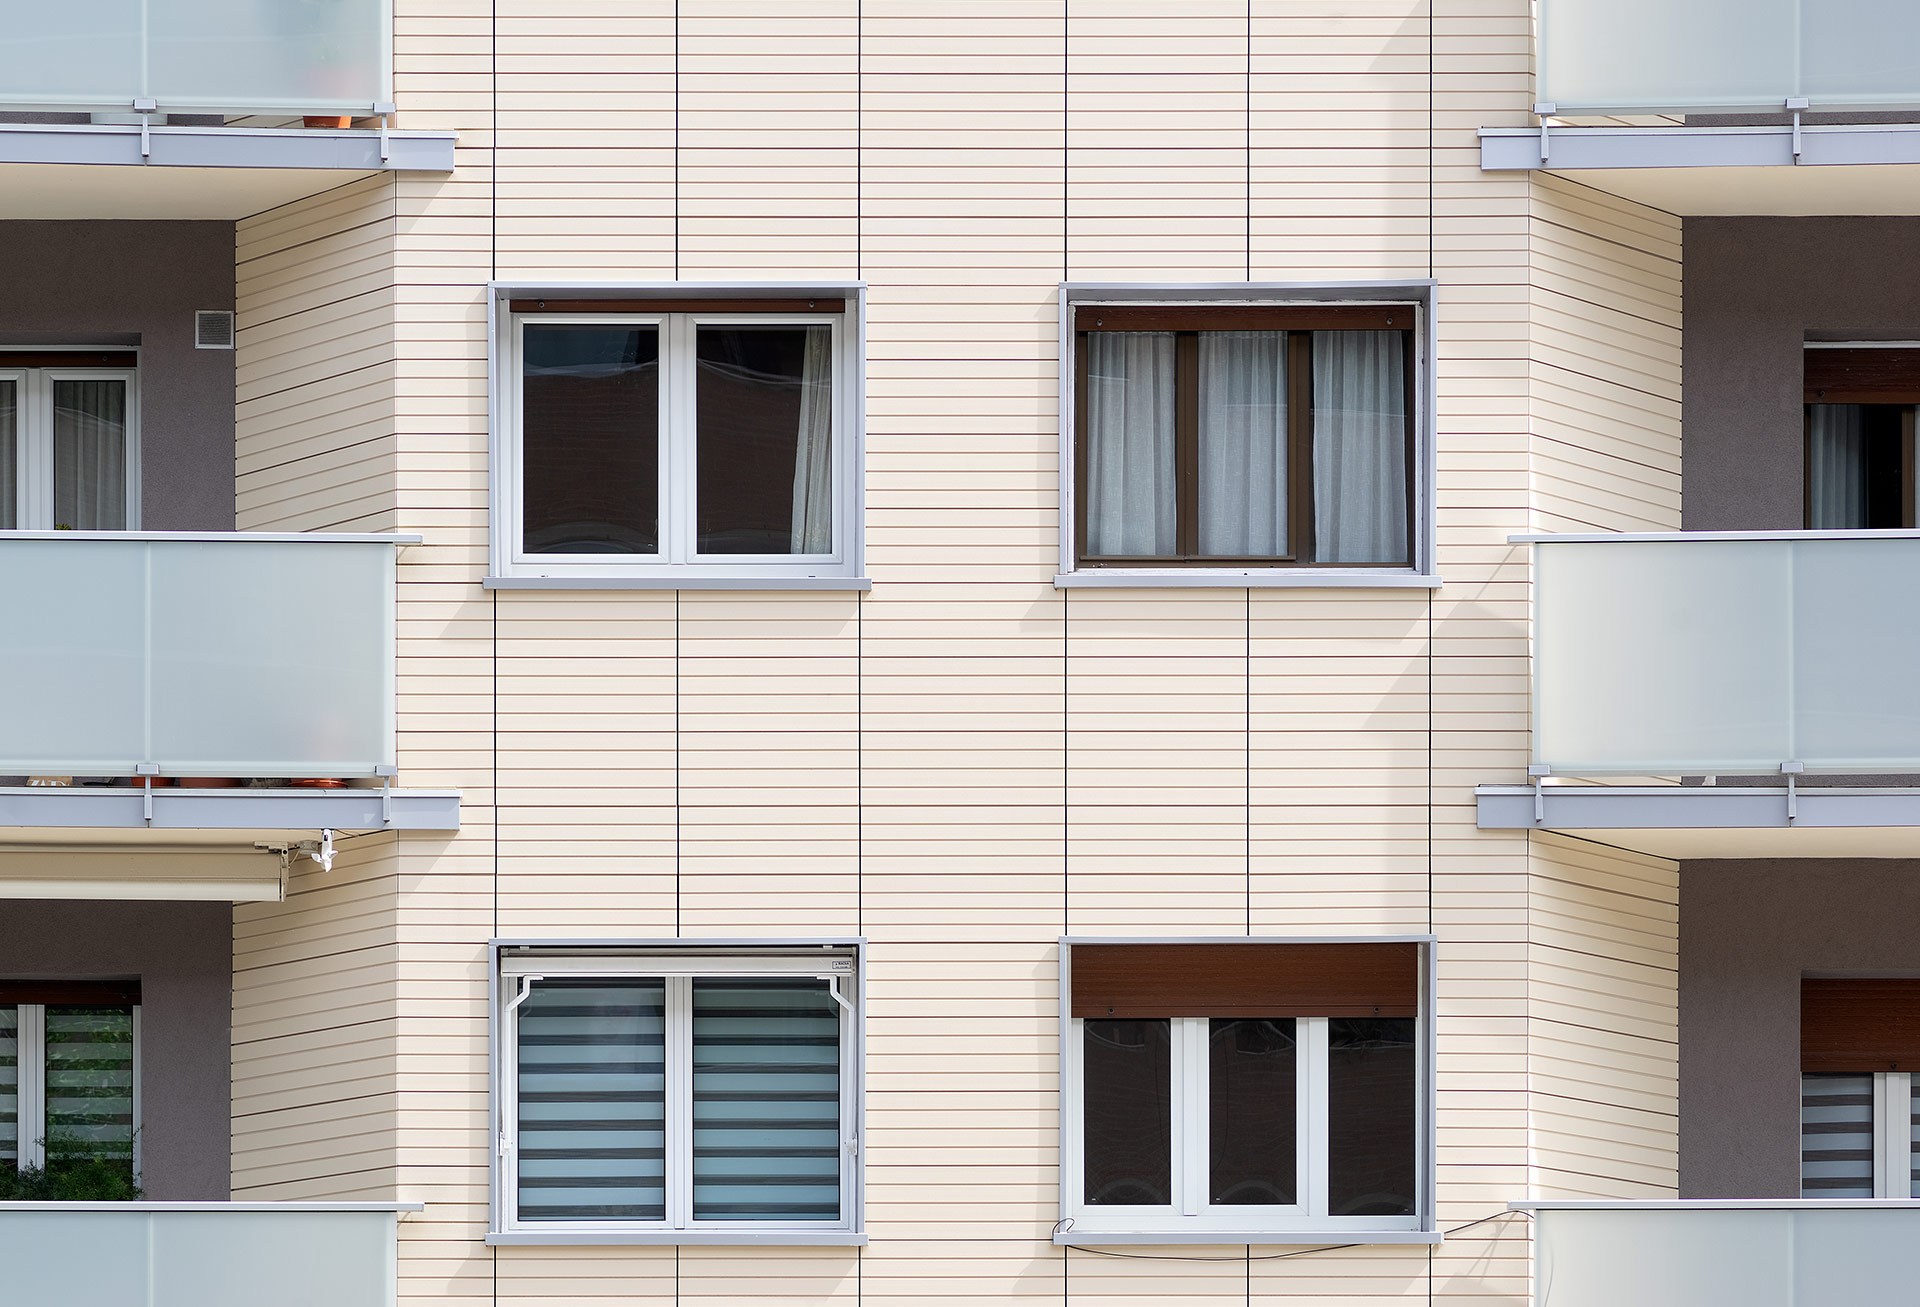 Rehabilitacion-energetica-fachada_ventilada-ceramica_BASA-Arquitectura-San-Sebastian-Donosti_1_b